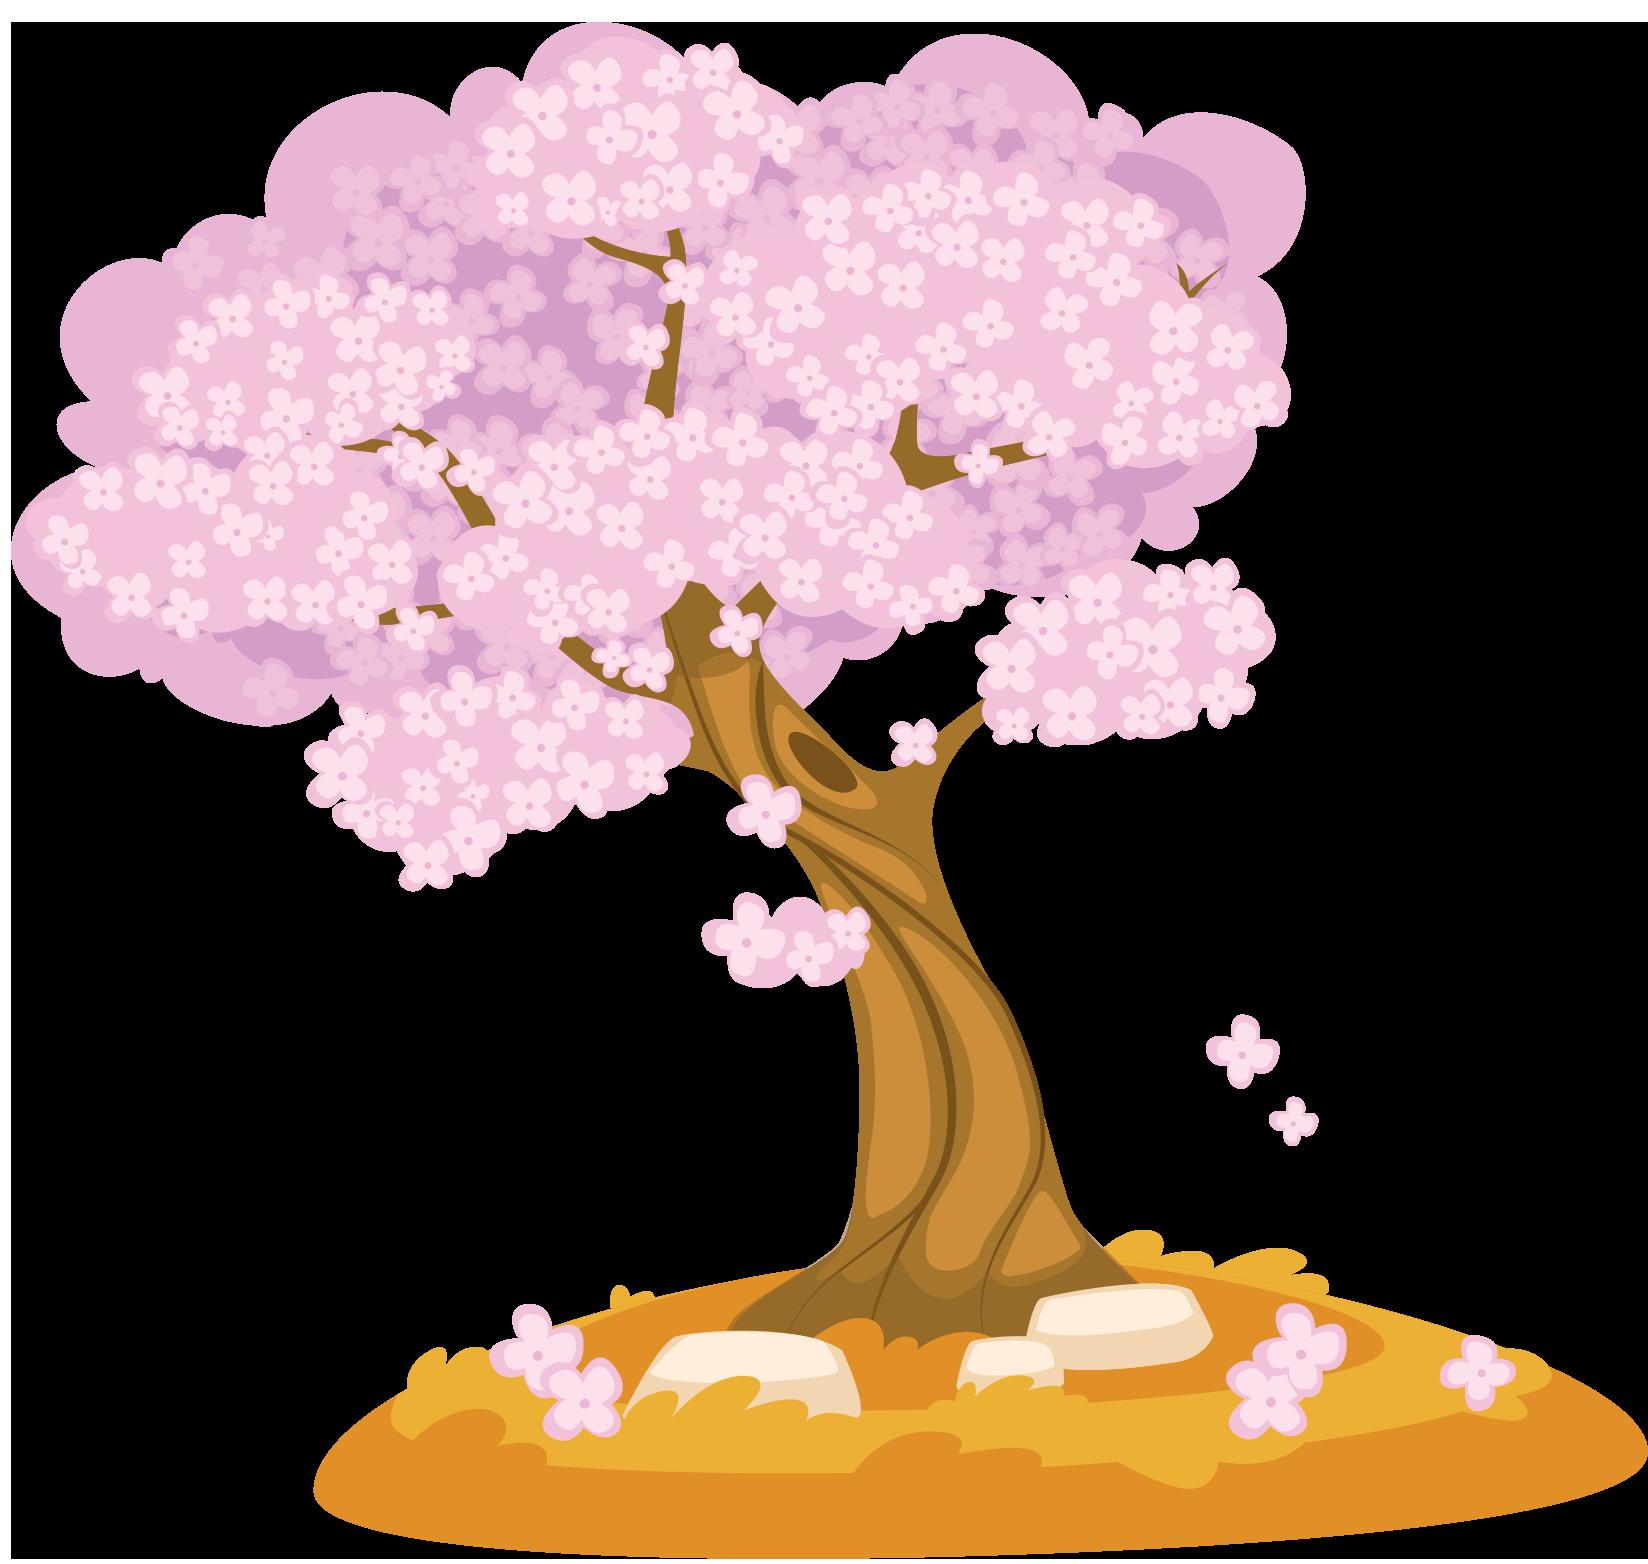 arbre saison printemps